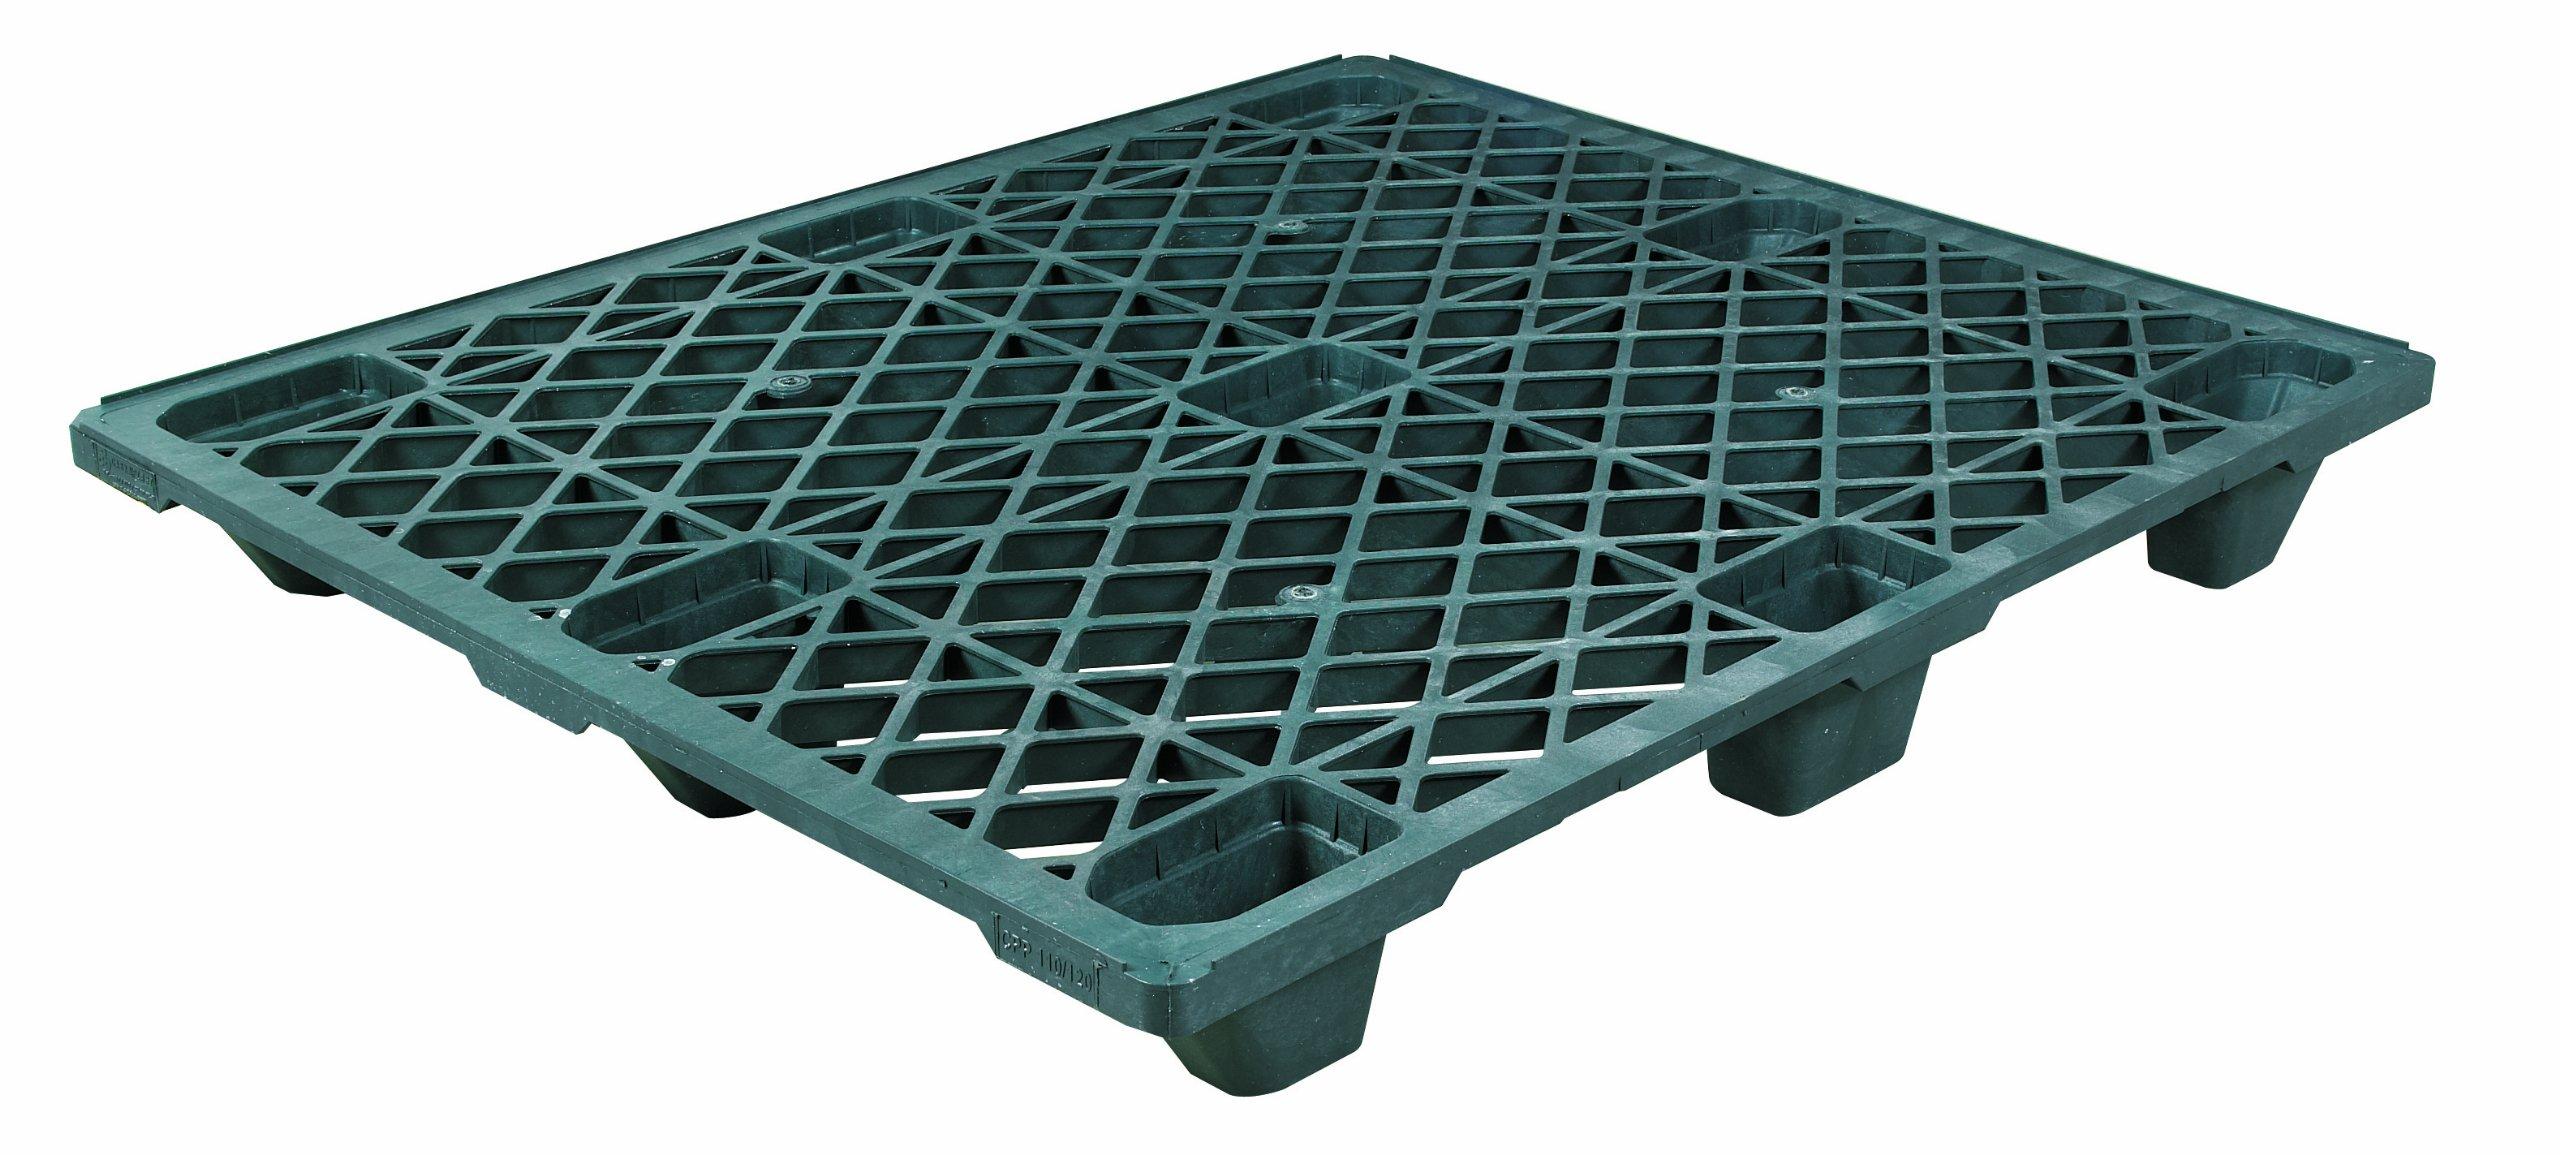 Aviditi CPP110 Economy Plastic Pallet, 48'' x 40'' x 5 1/10'', Black